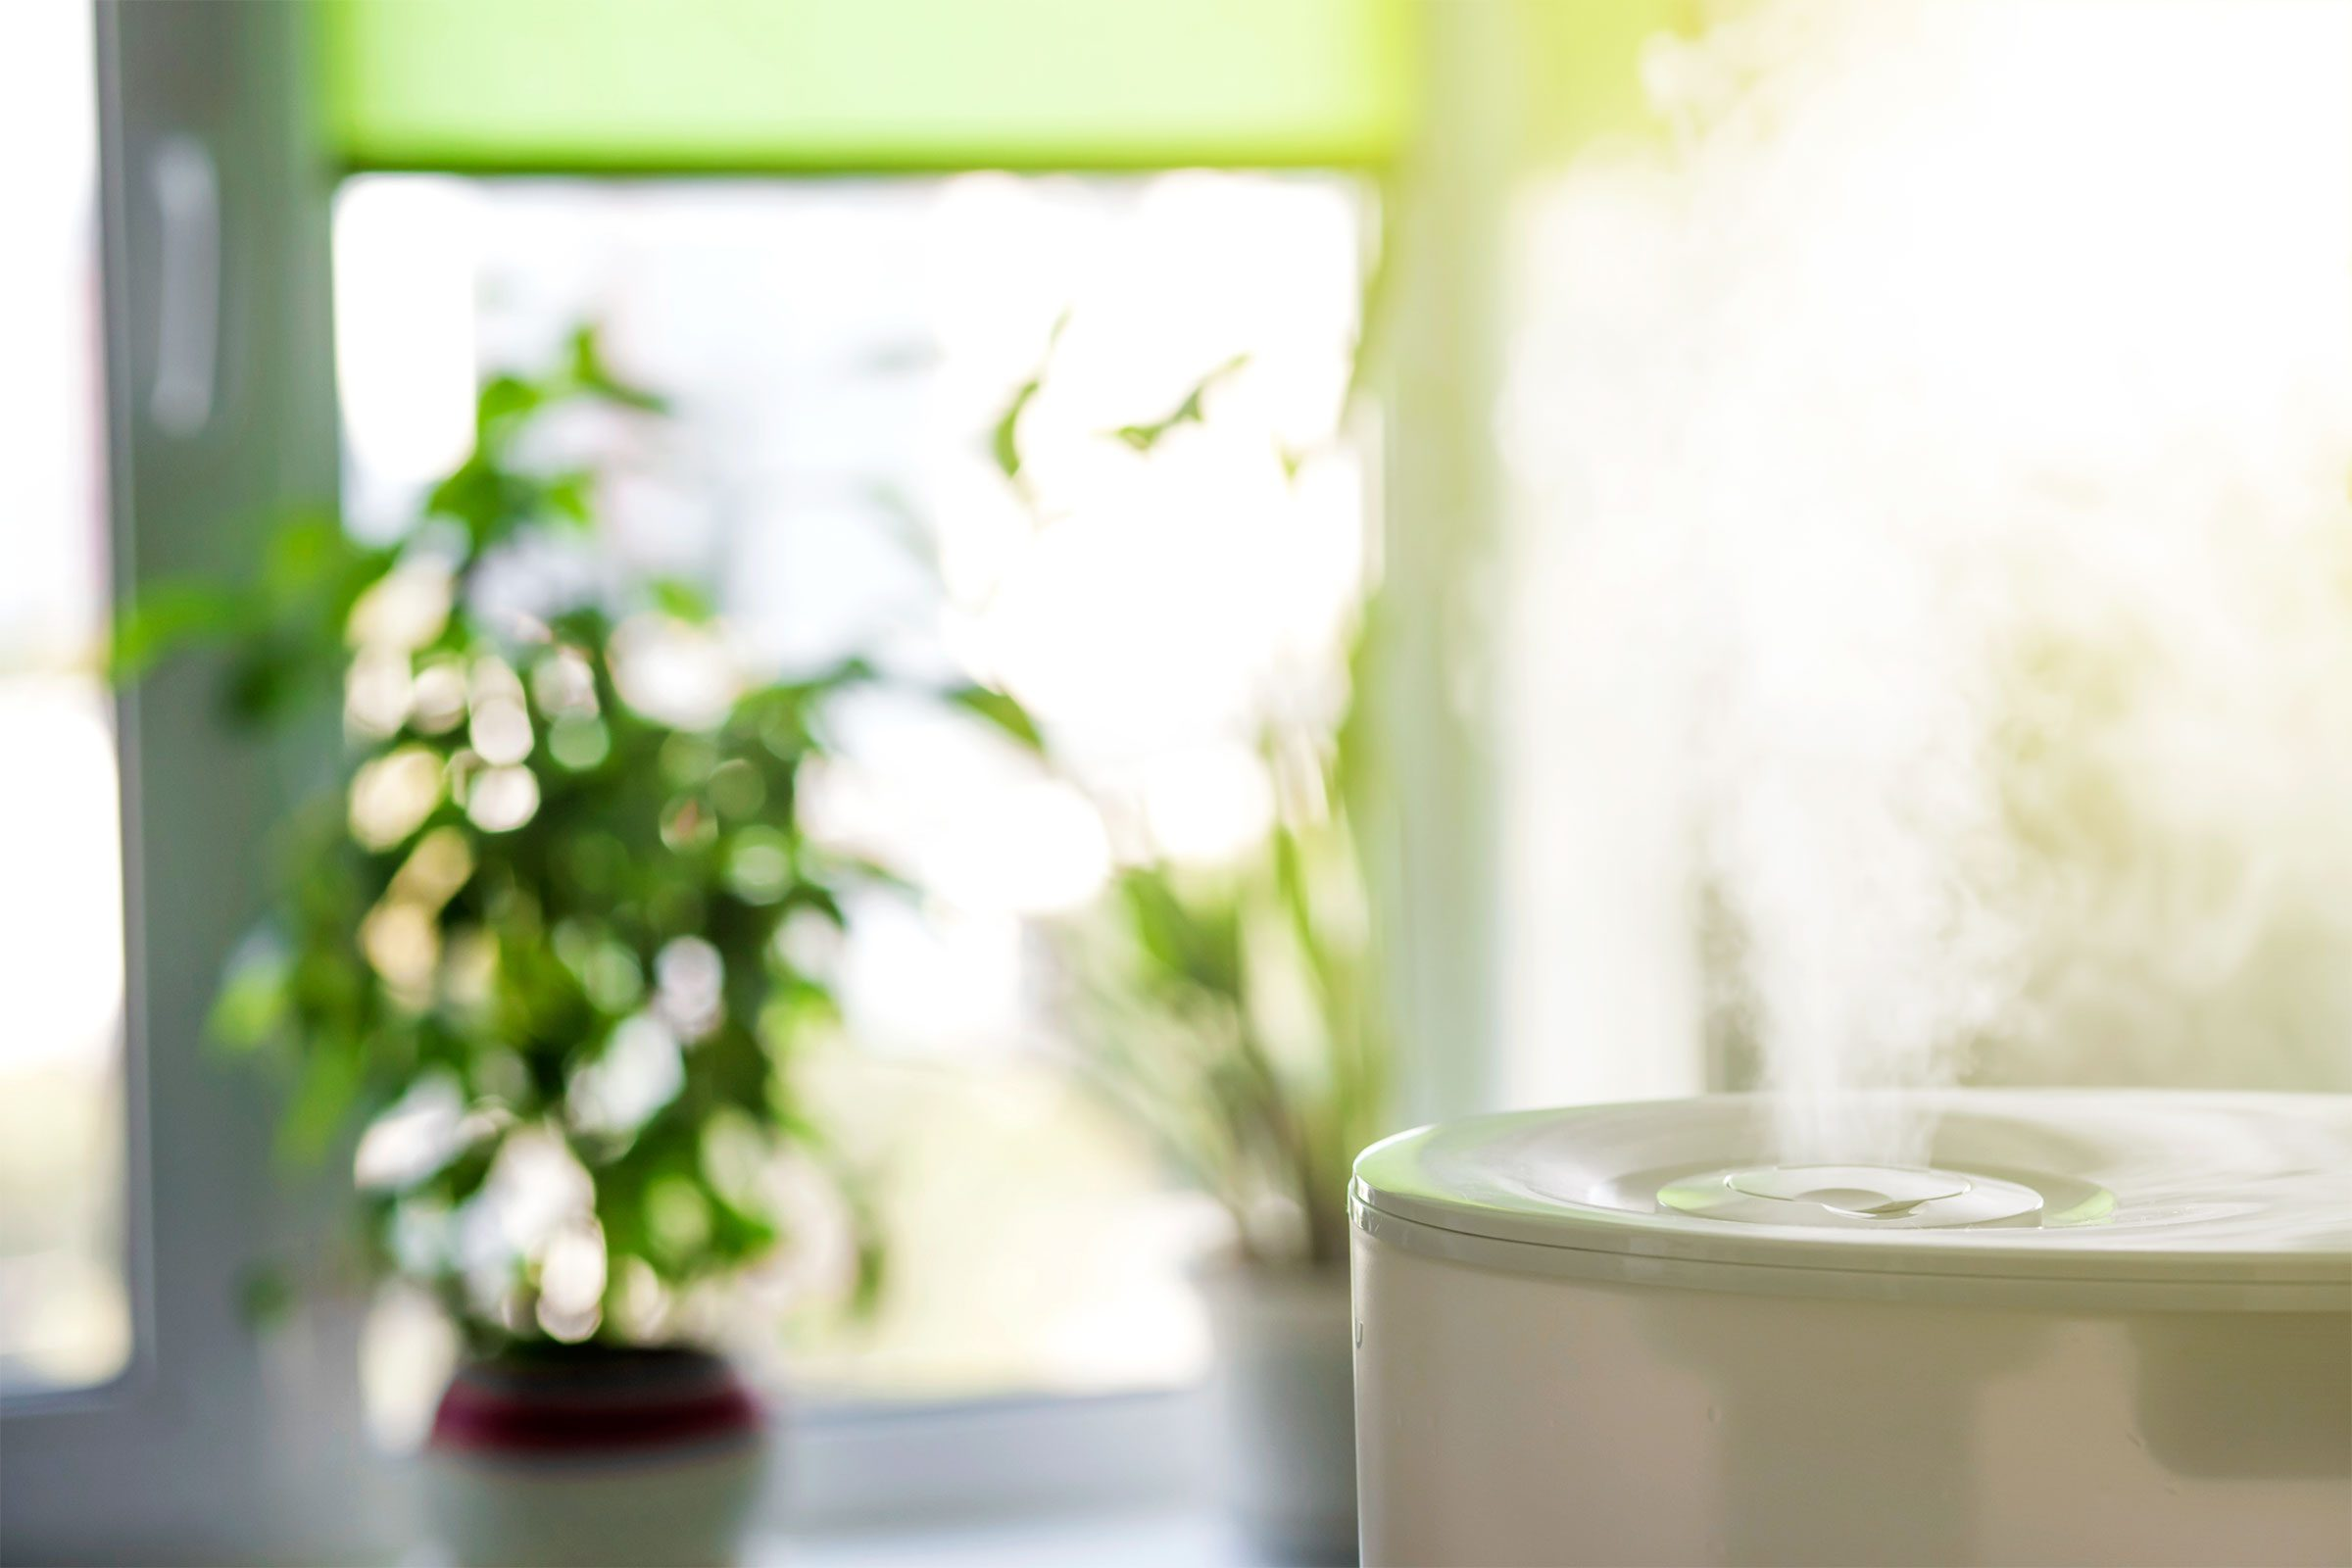 https://www.amazon.com/Cool-Mist-Humidifier-Bedroom-Ultrasonic/dp/B077Z2QCS5/